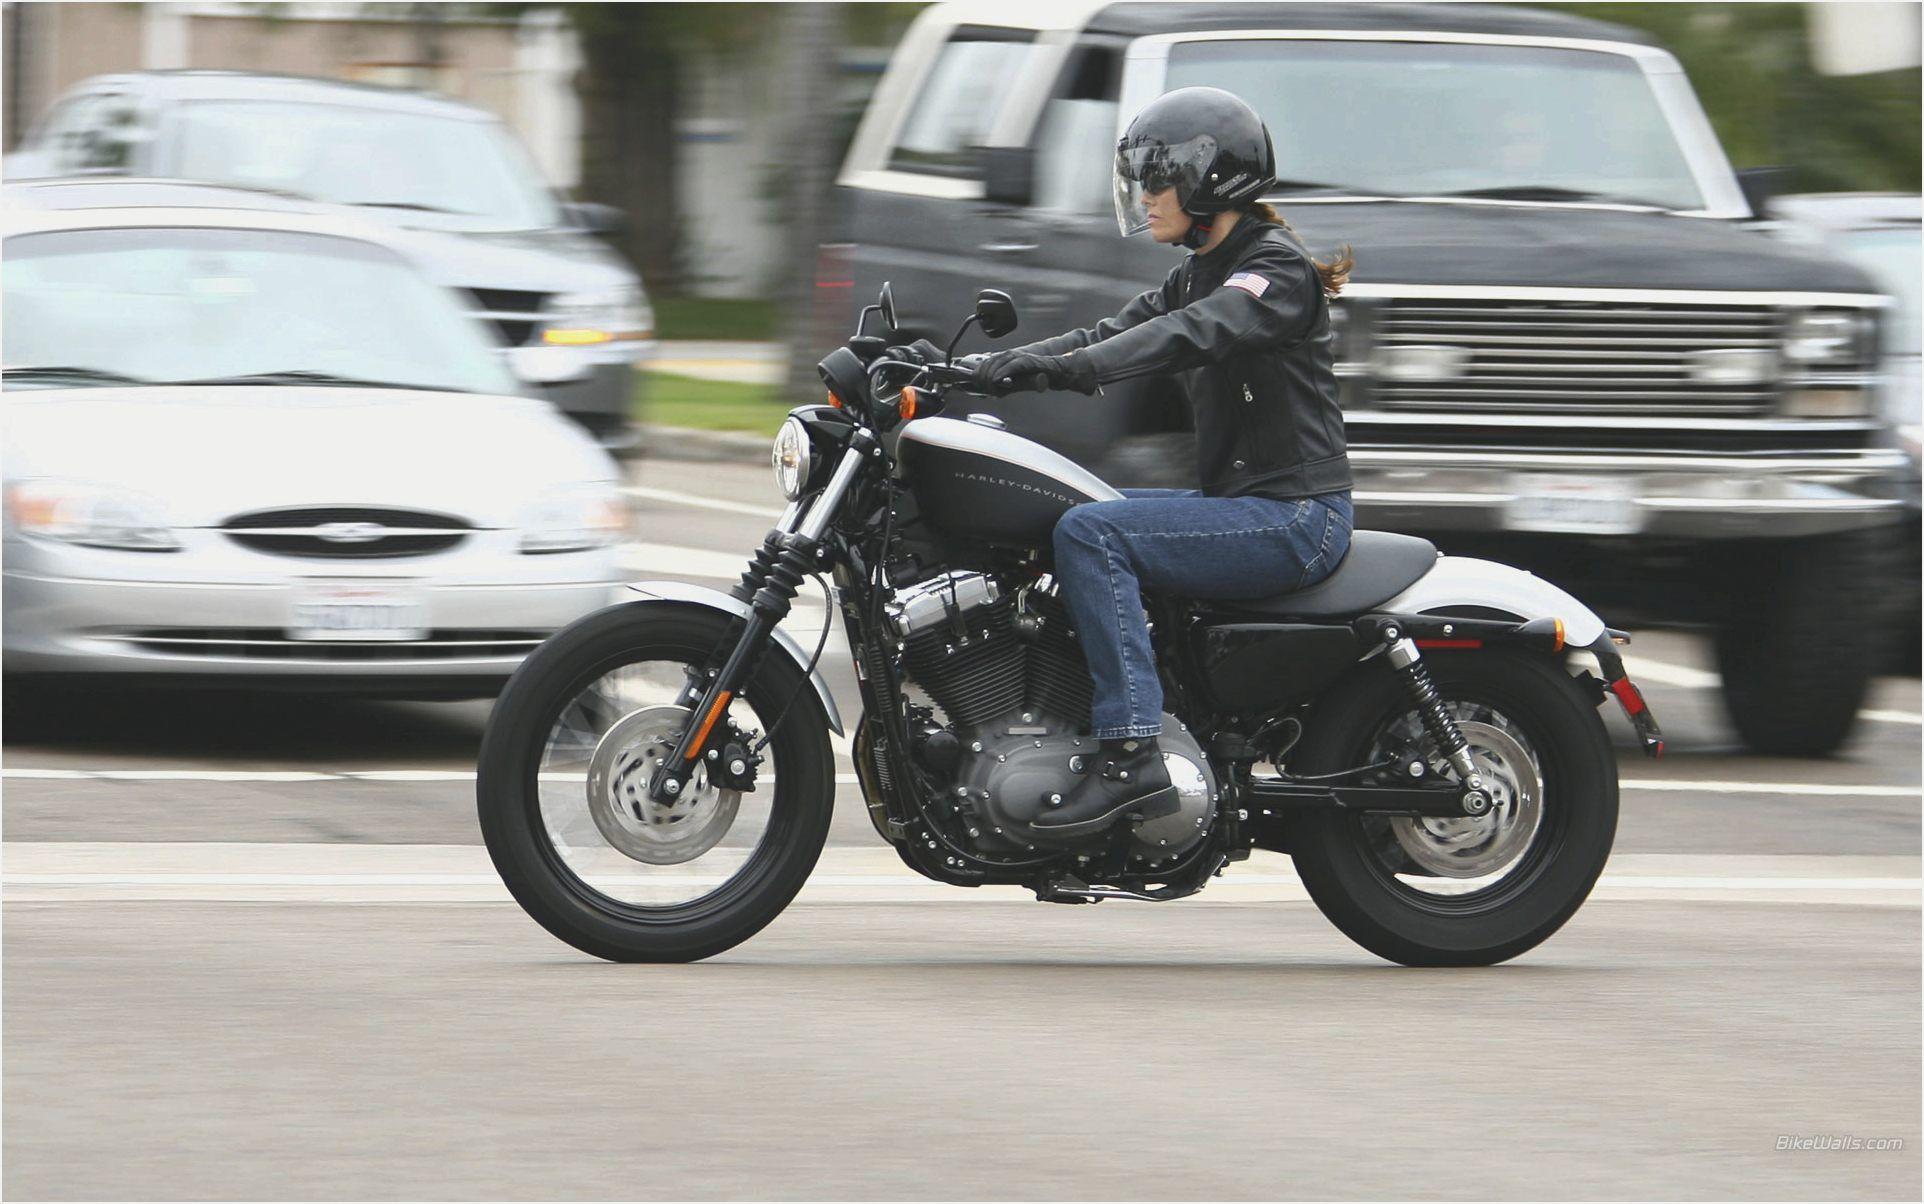 2007 Harley Davidson XL 1200N Sportster 1200 Nightster Review ...